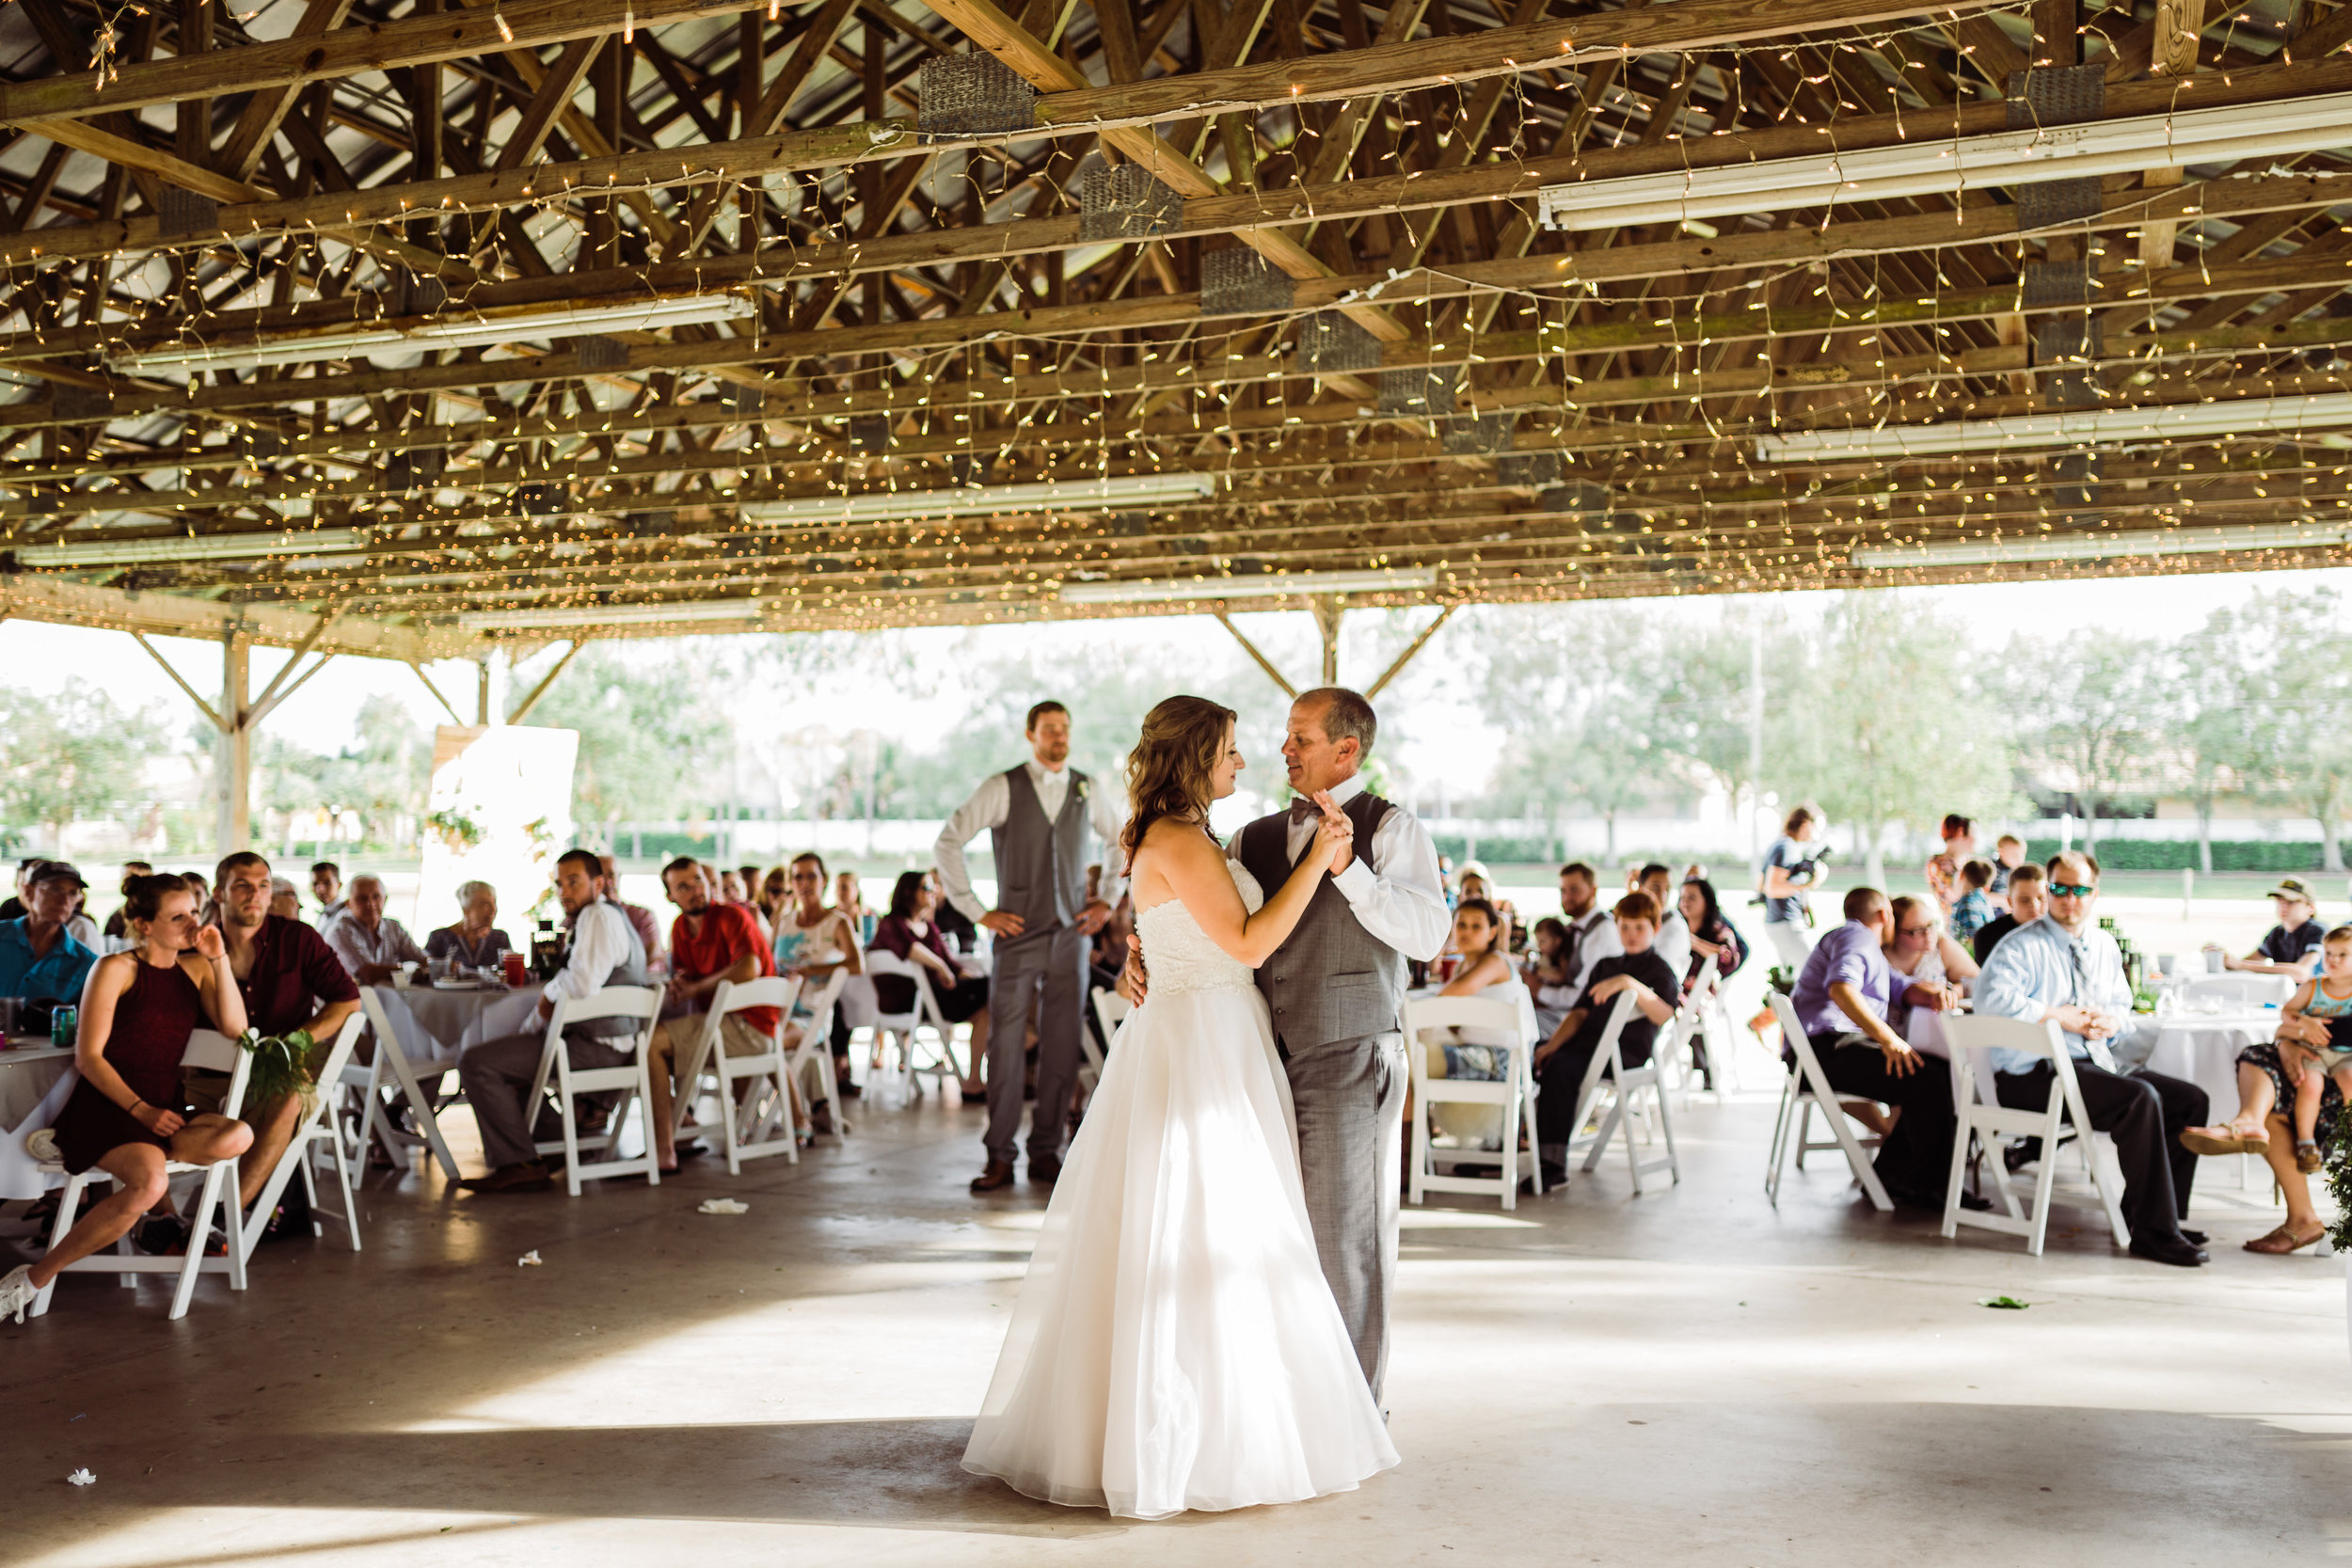 2017.10.14 Samantha and Matthew Crabtree Sarasota Wedding (464 of 708).jpg